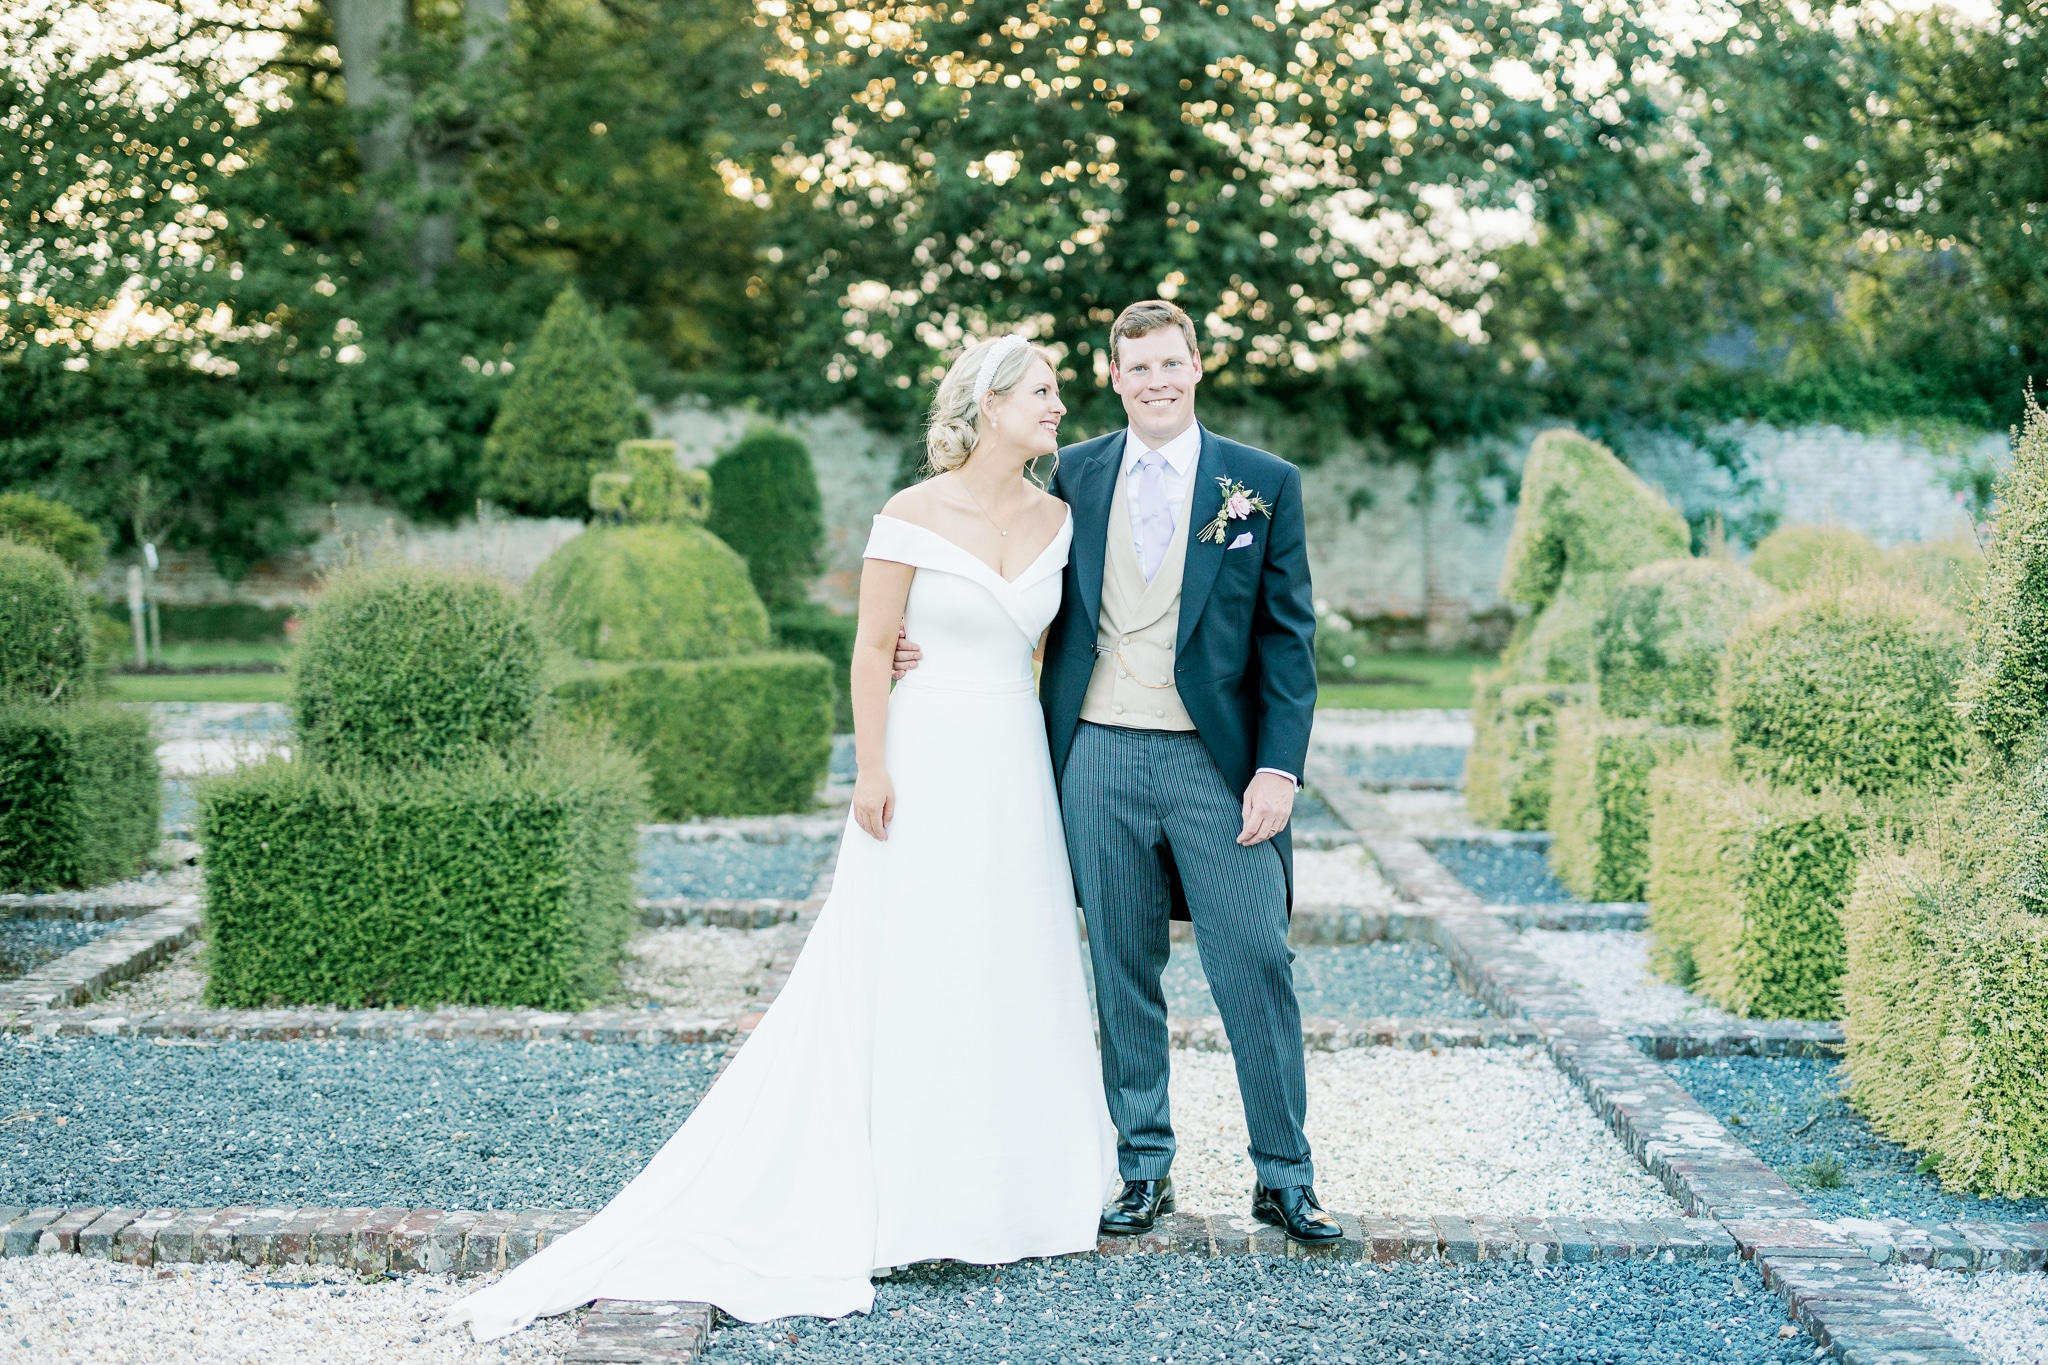 Brickwall House walled garden wedding photography in Rye